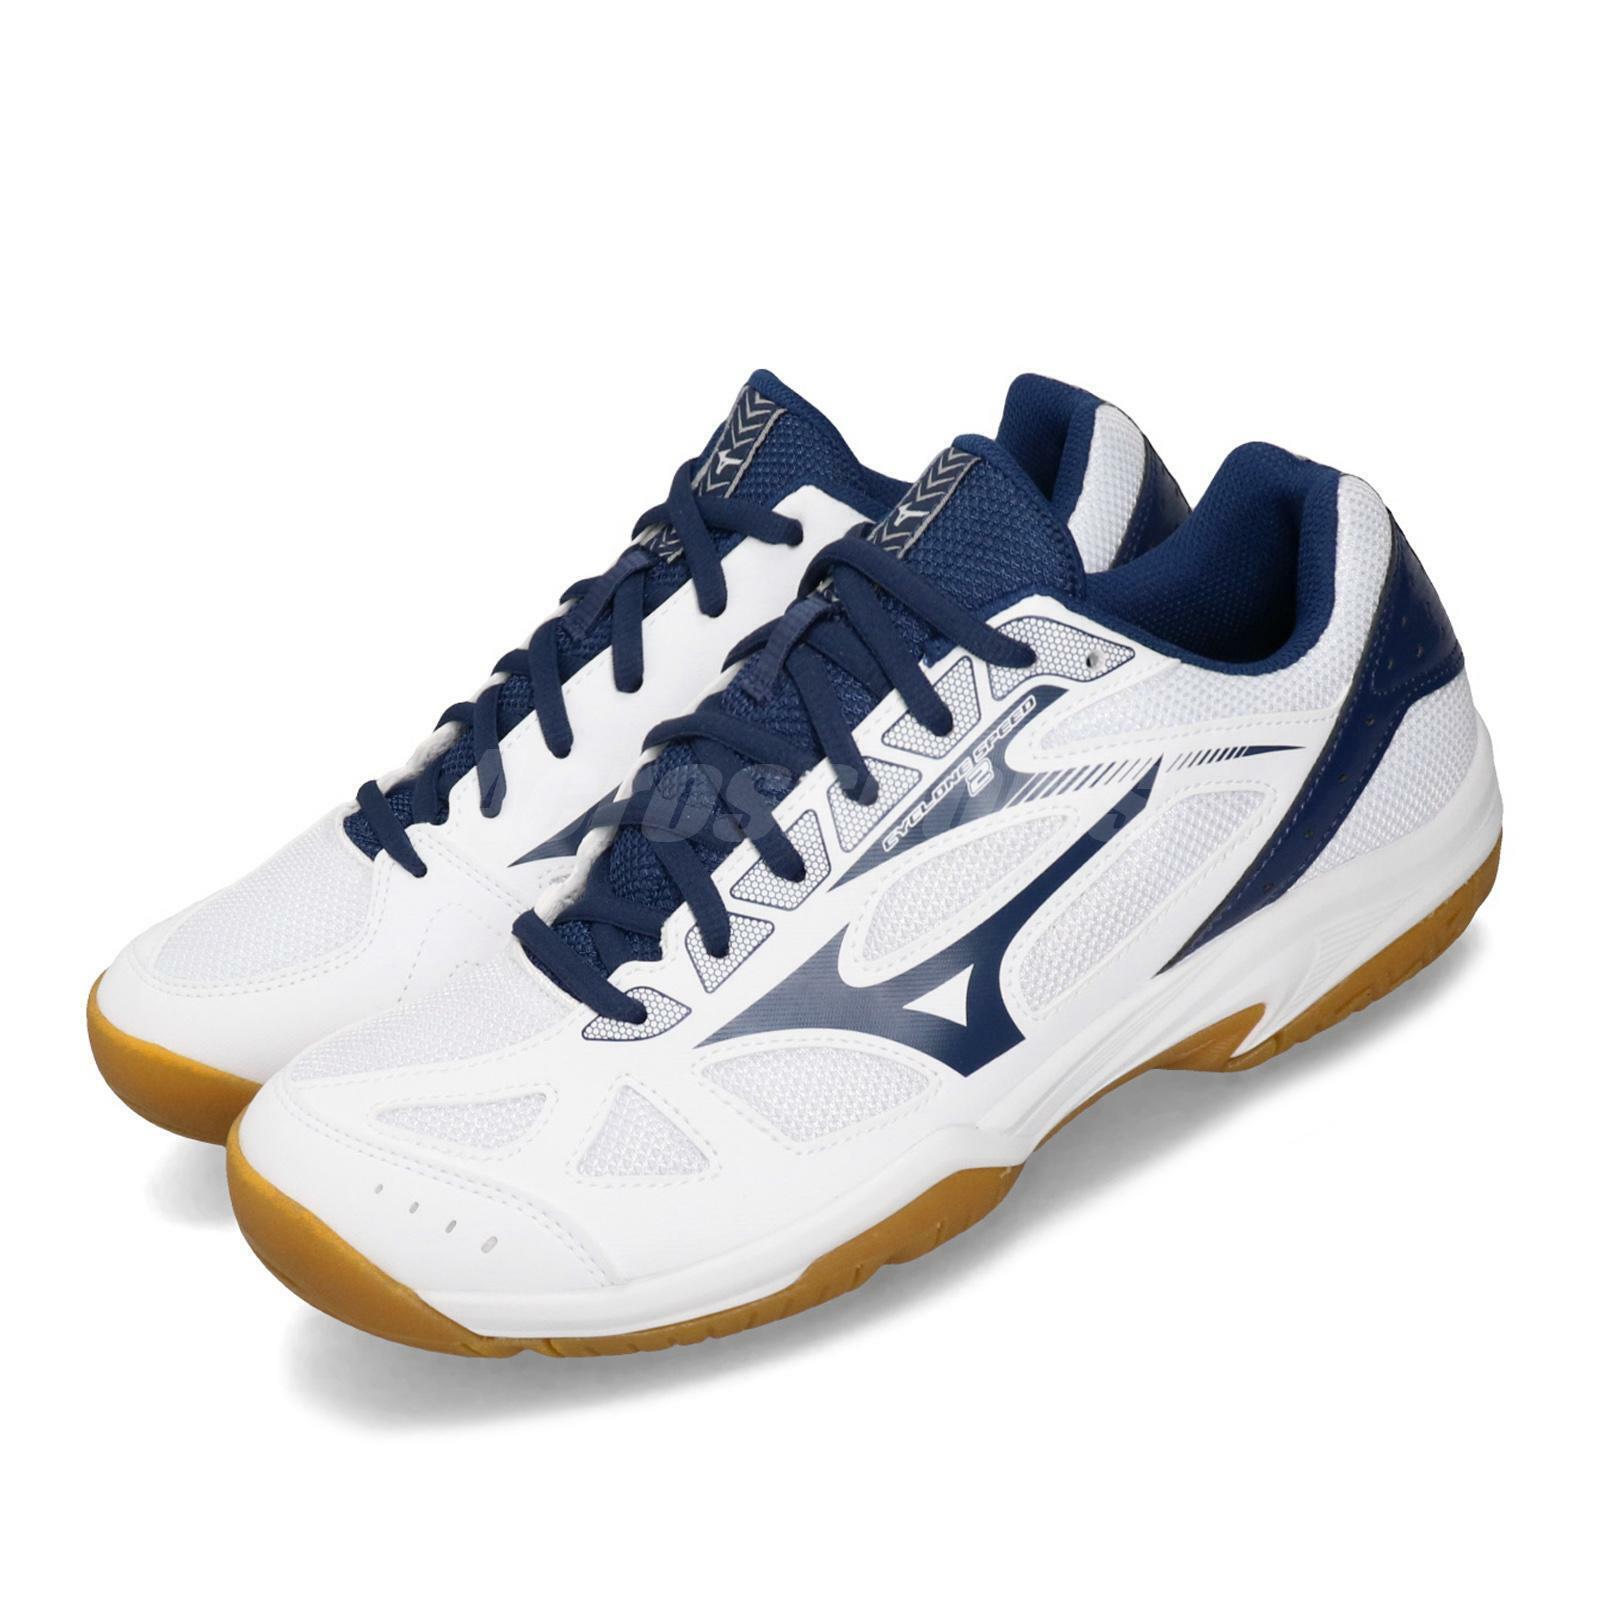 Mizuno Cyclone Speed 2 bianca blu Volleybtutti Badminton sautope sautope da ginnastica V1GA1980-16 Sautope classeiche da uomo